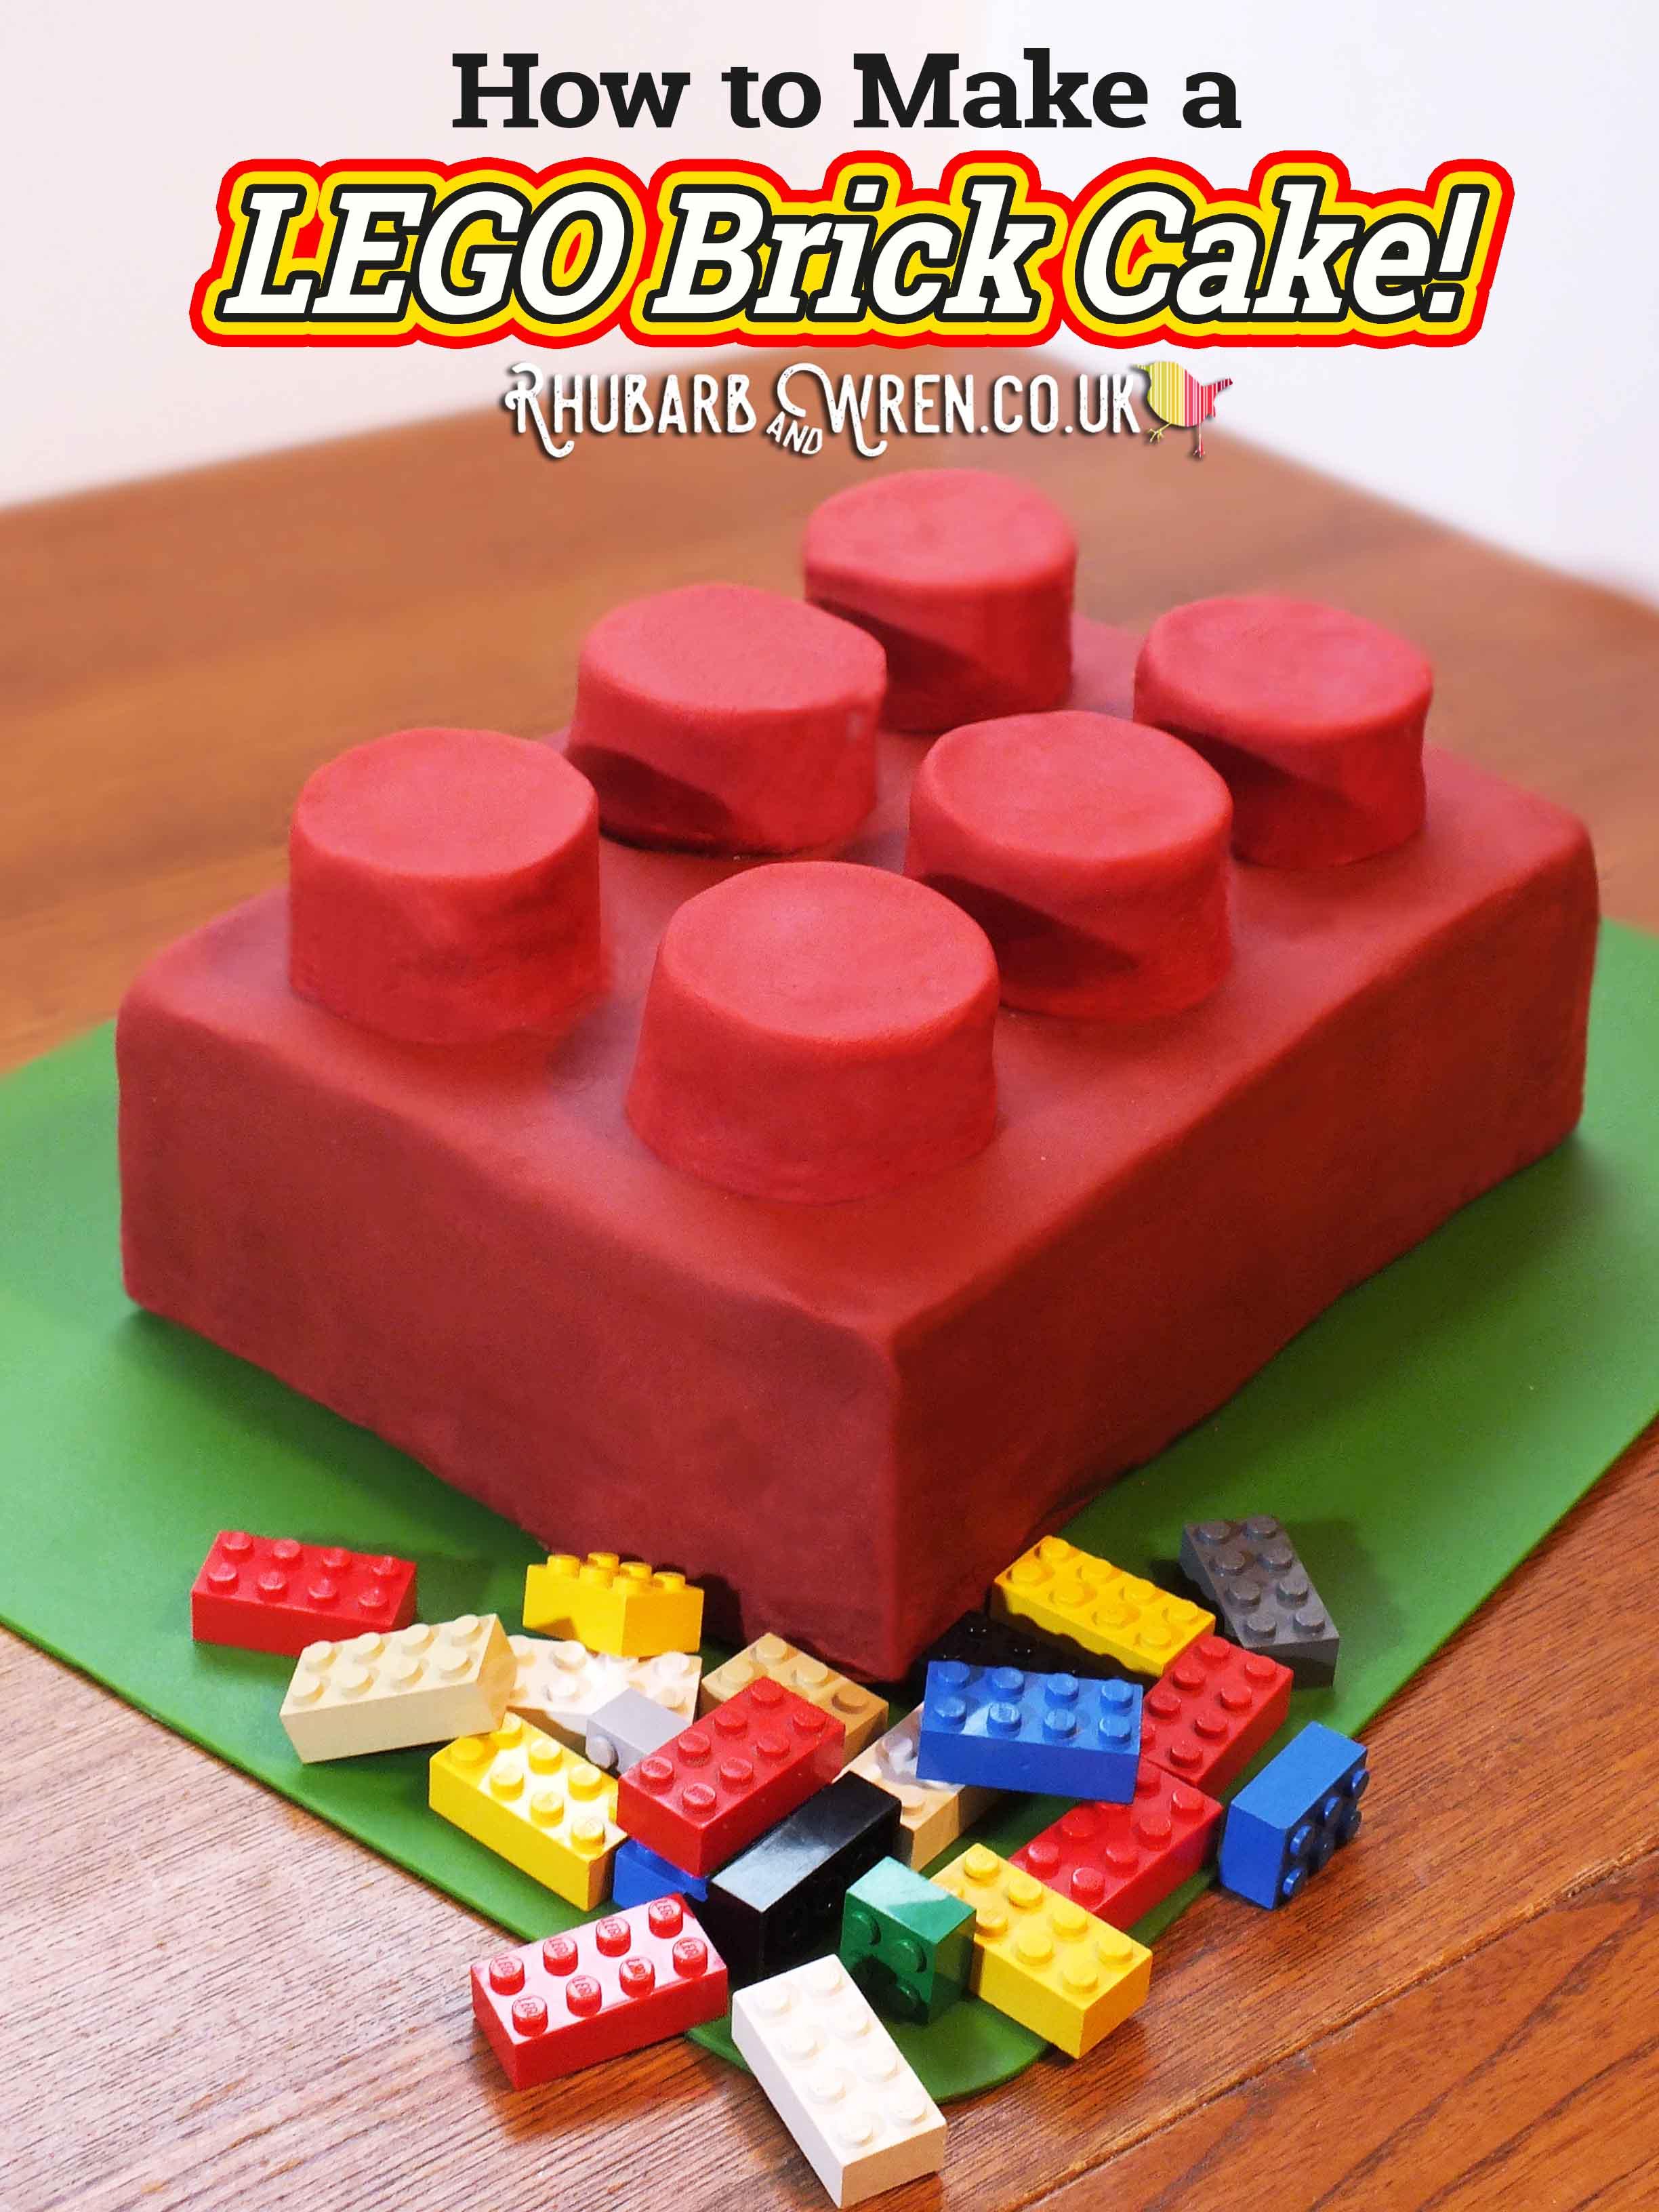 How to make a giant Lego brick cake